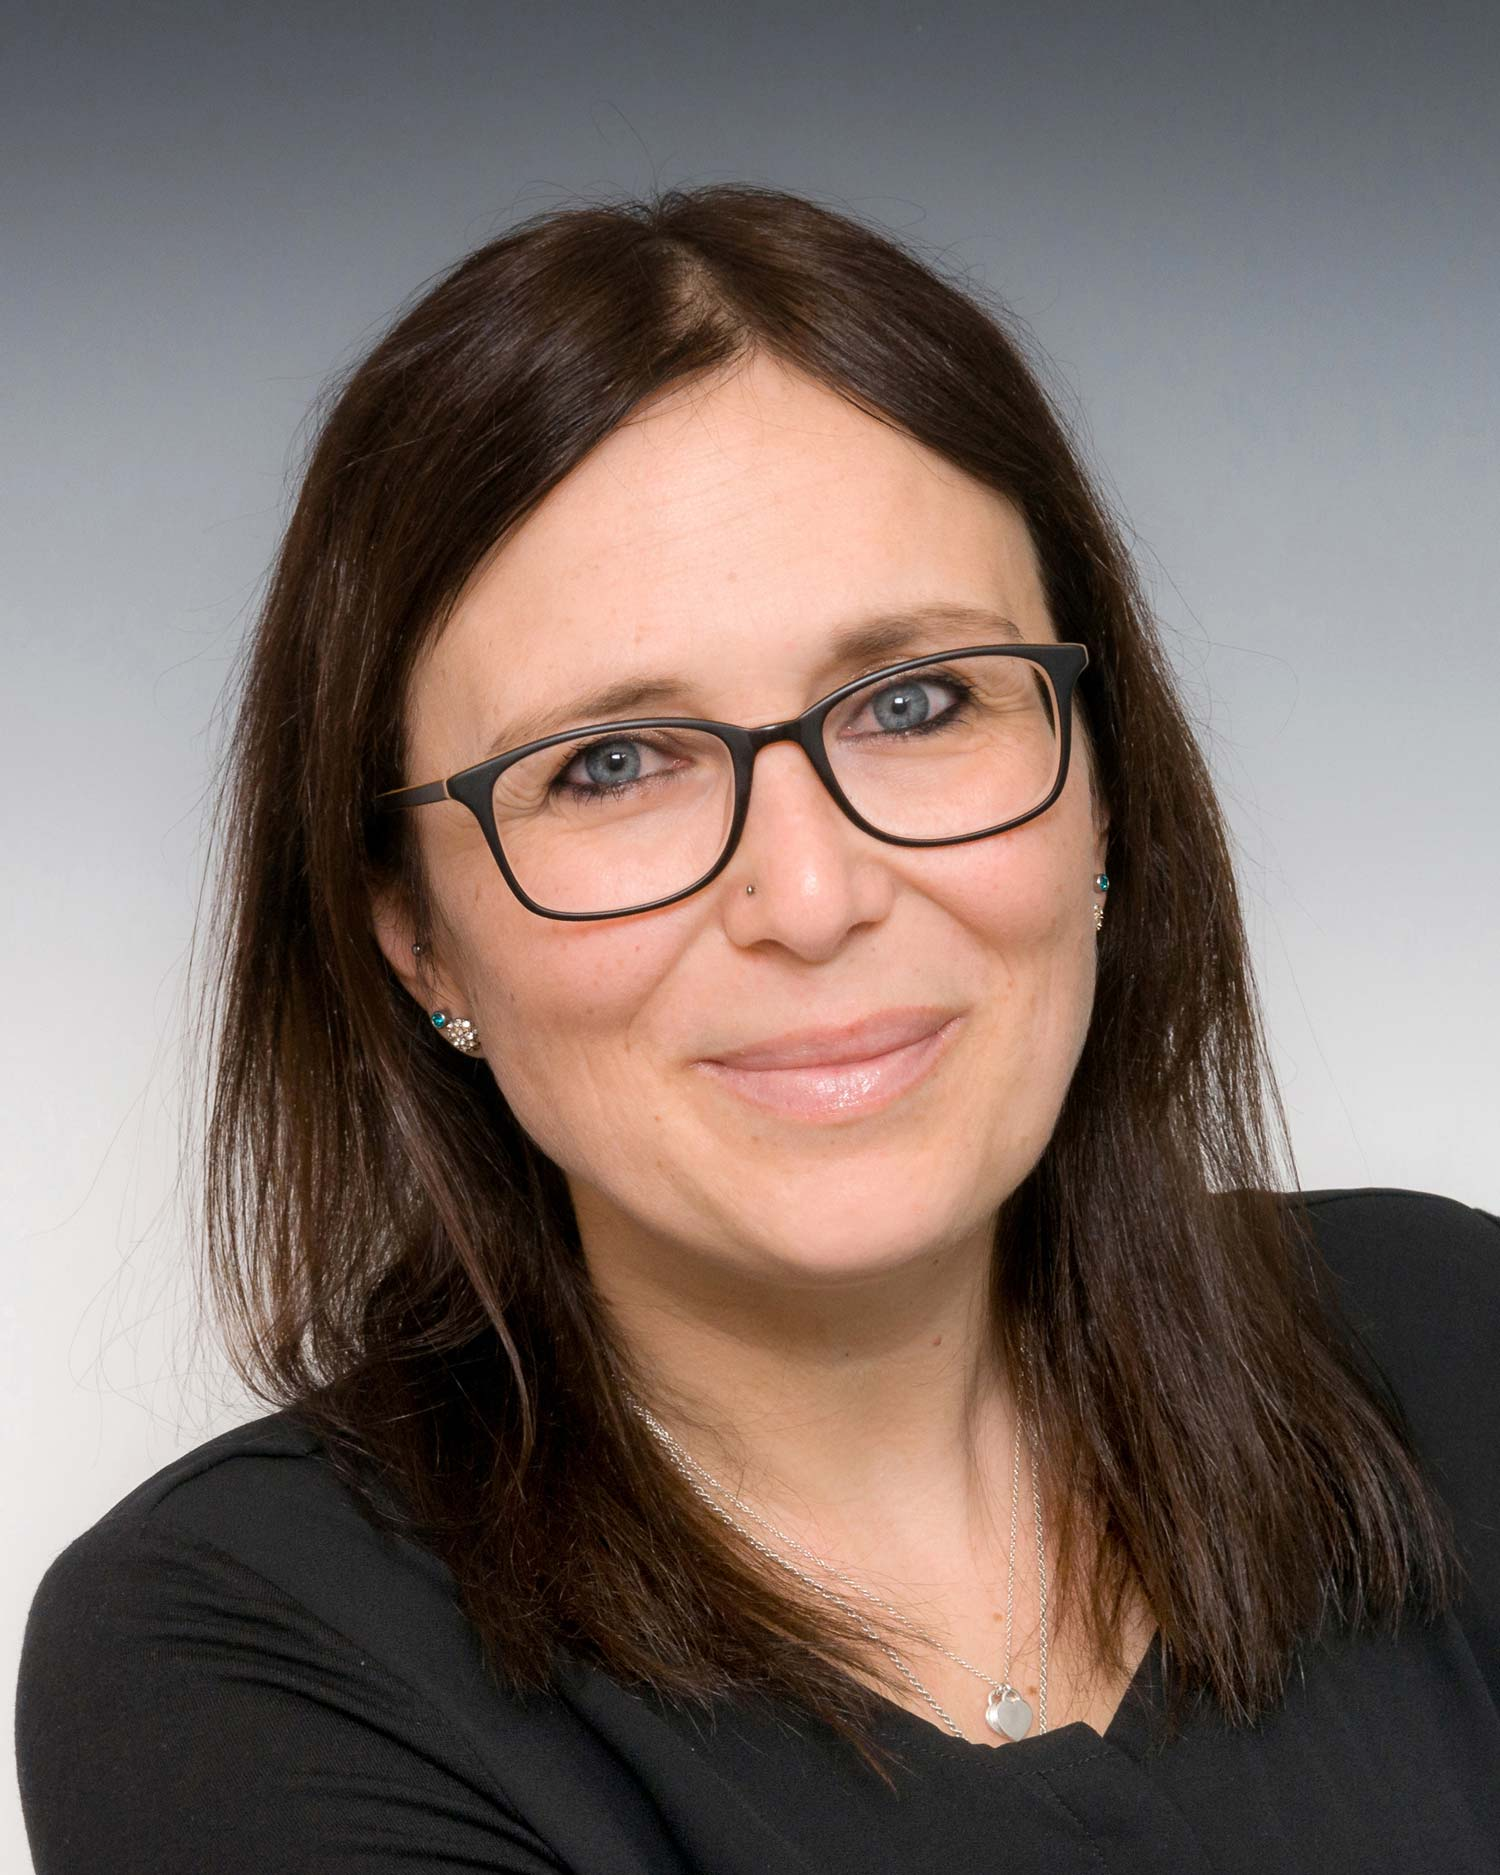 Sylvia Hoffmann-Märcz